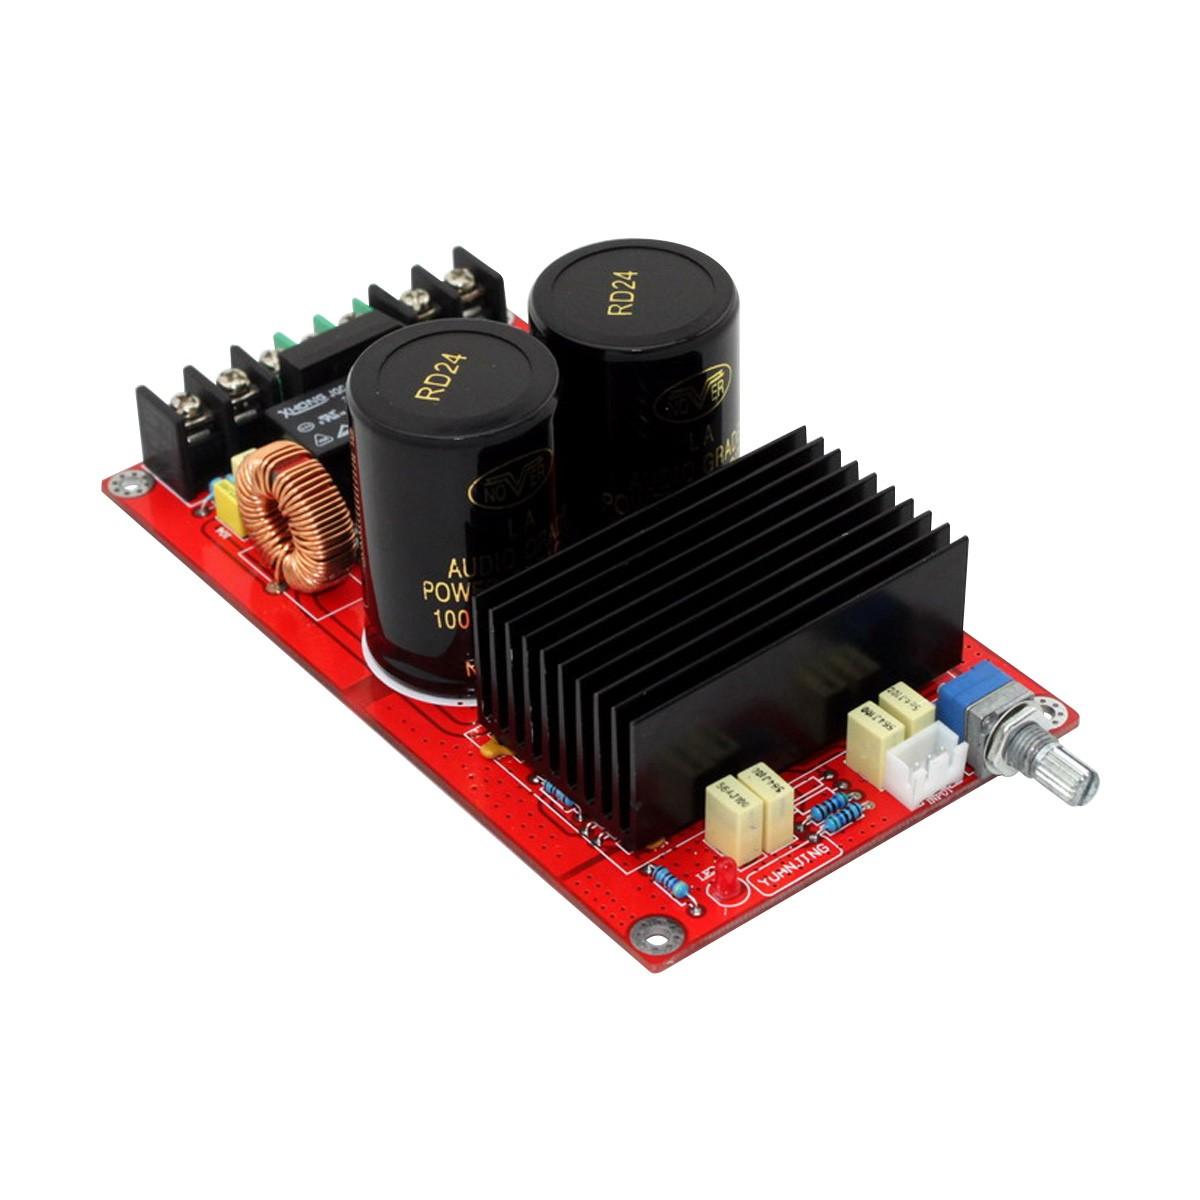 AMP8950-2X120 Amplifier Module Class D TDA8950 2 x 120W 4 Ohm